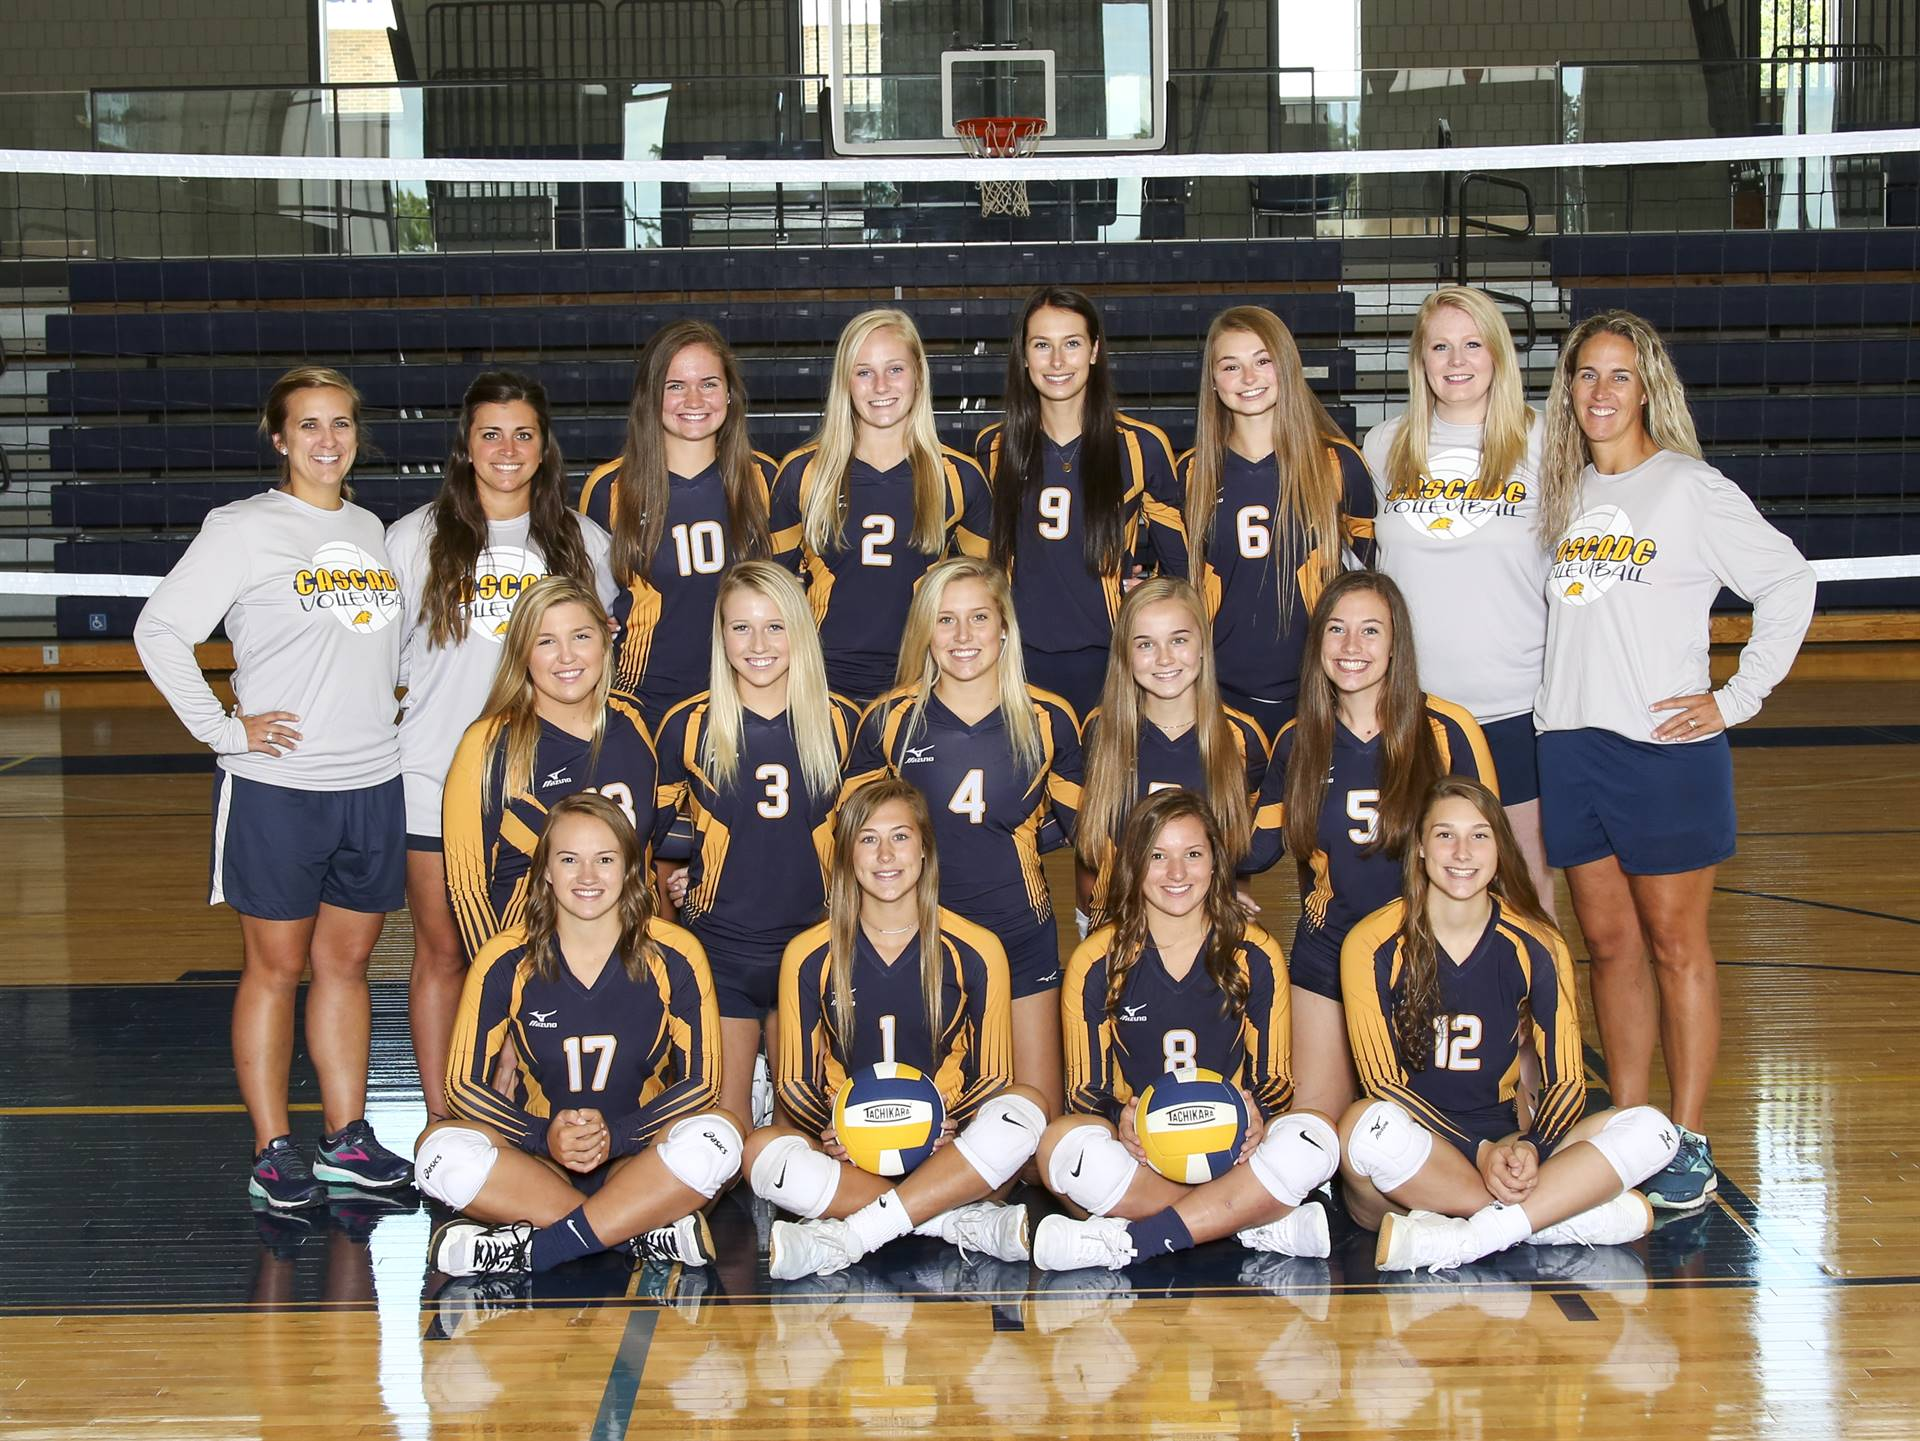 CHS varsity volleyball team